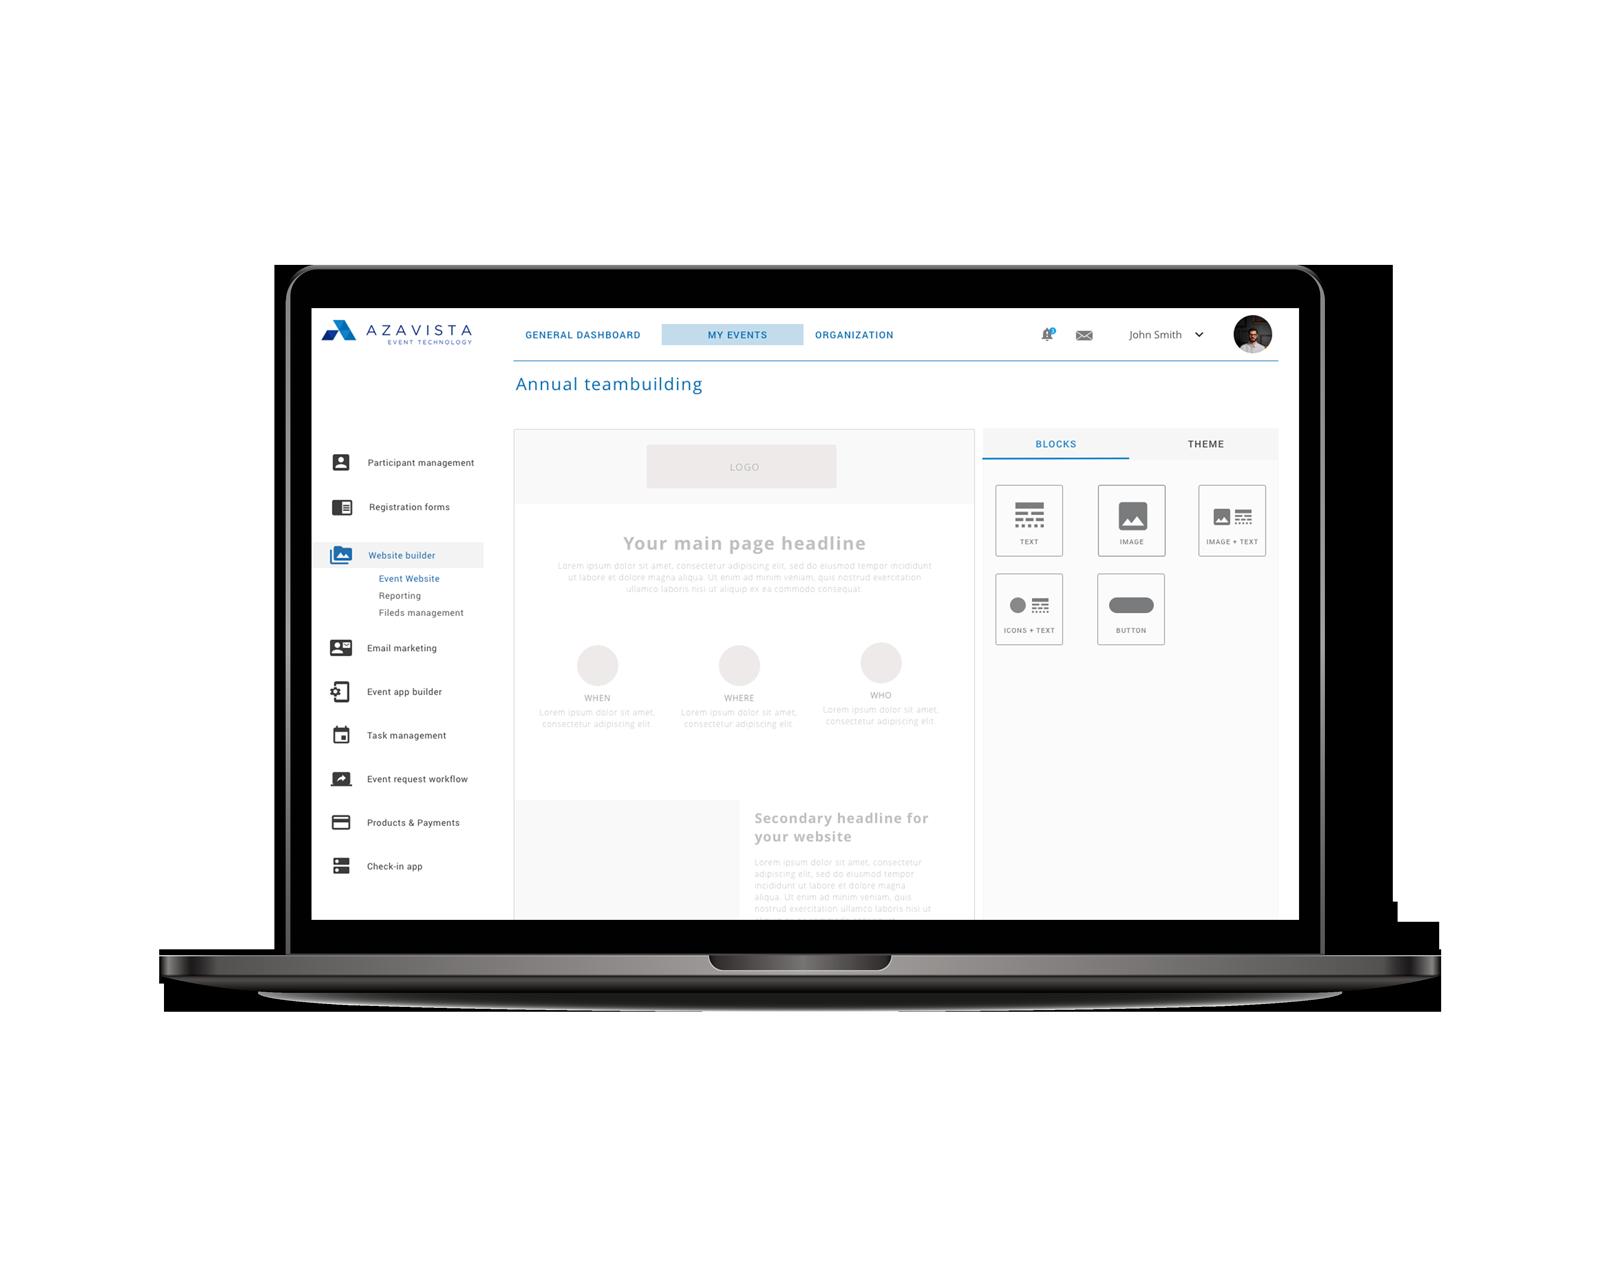 website-content-management-2.png